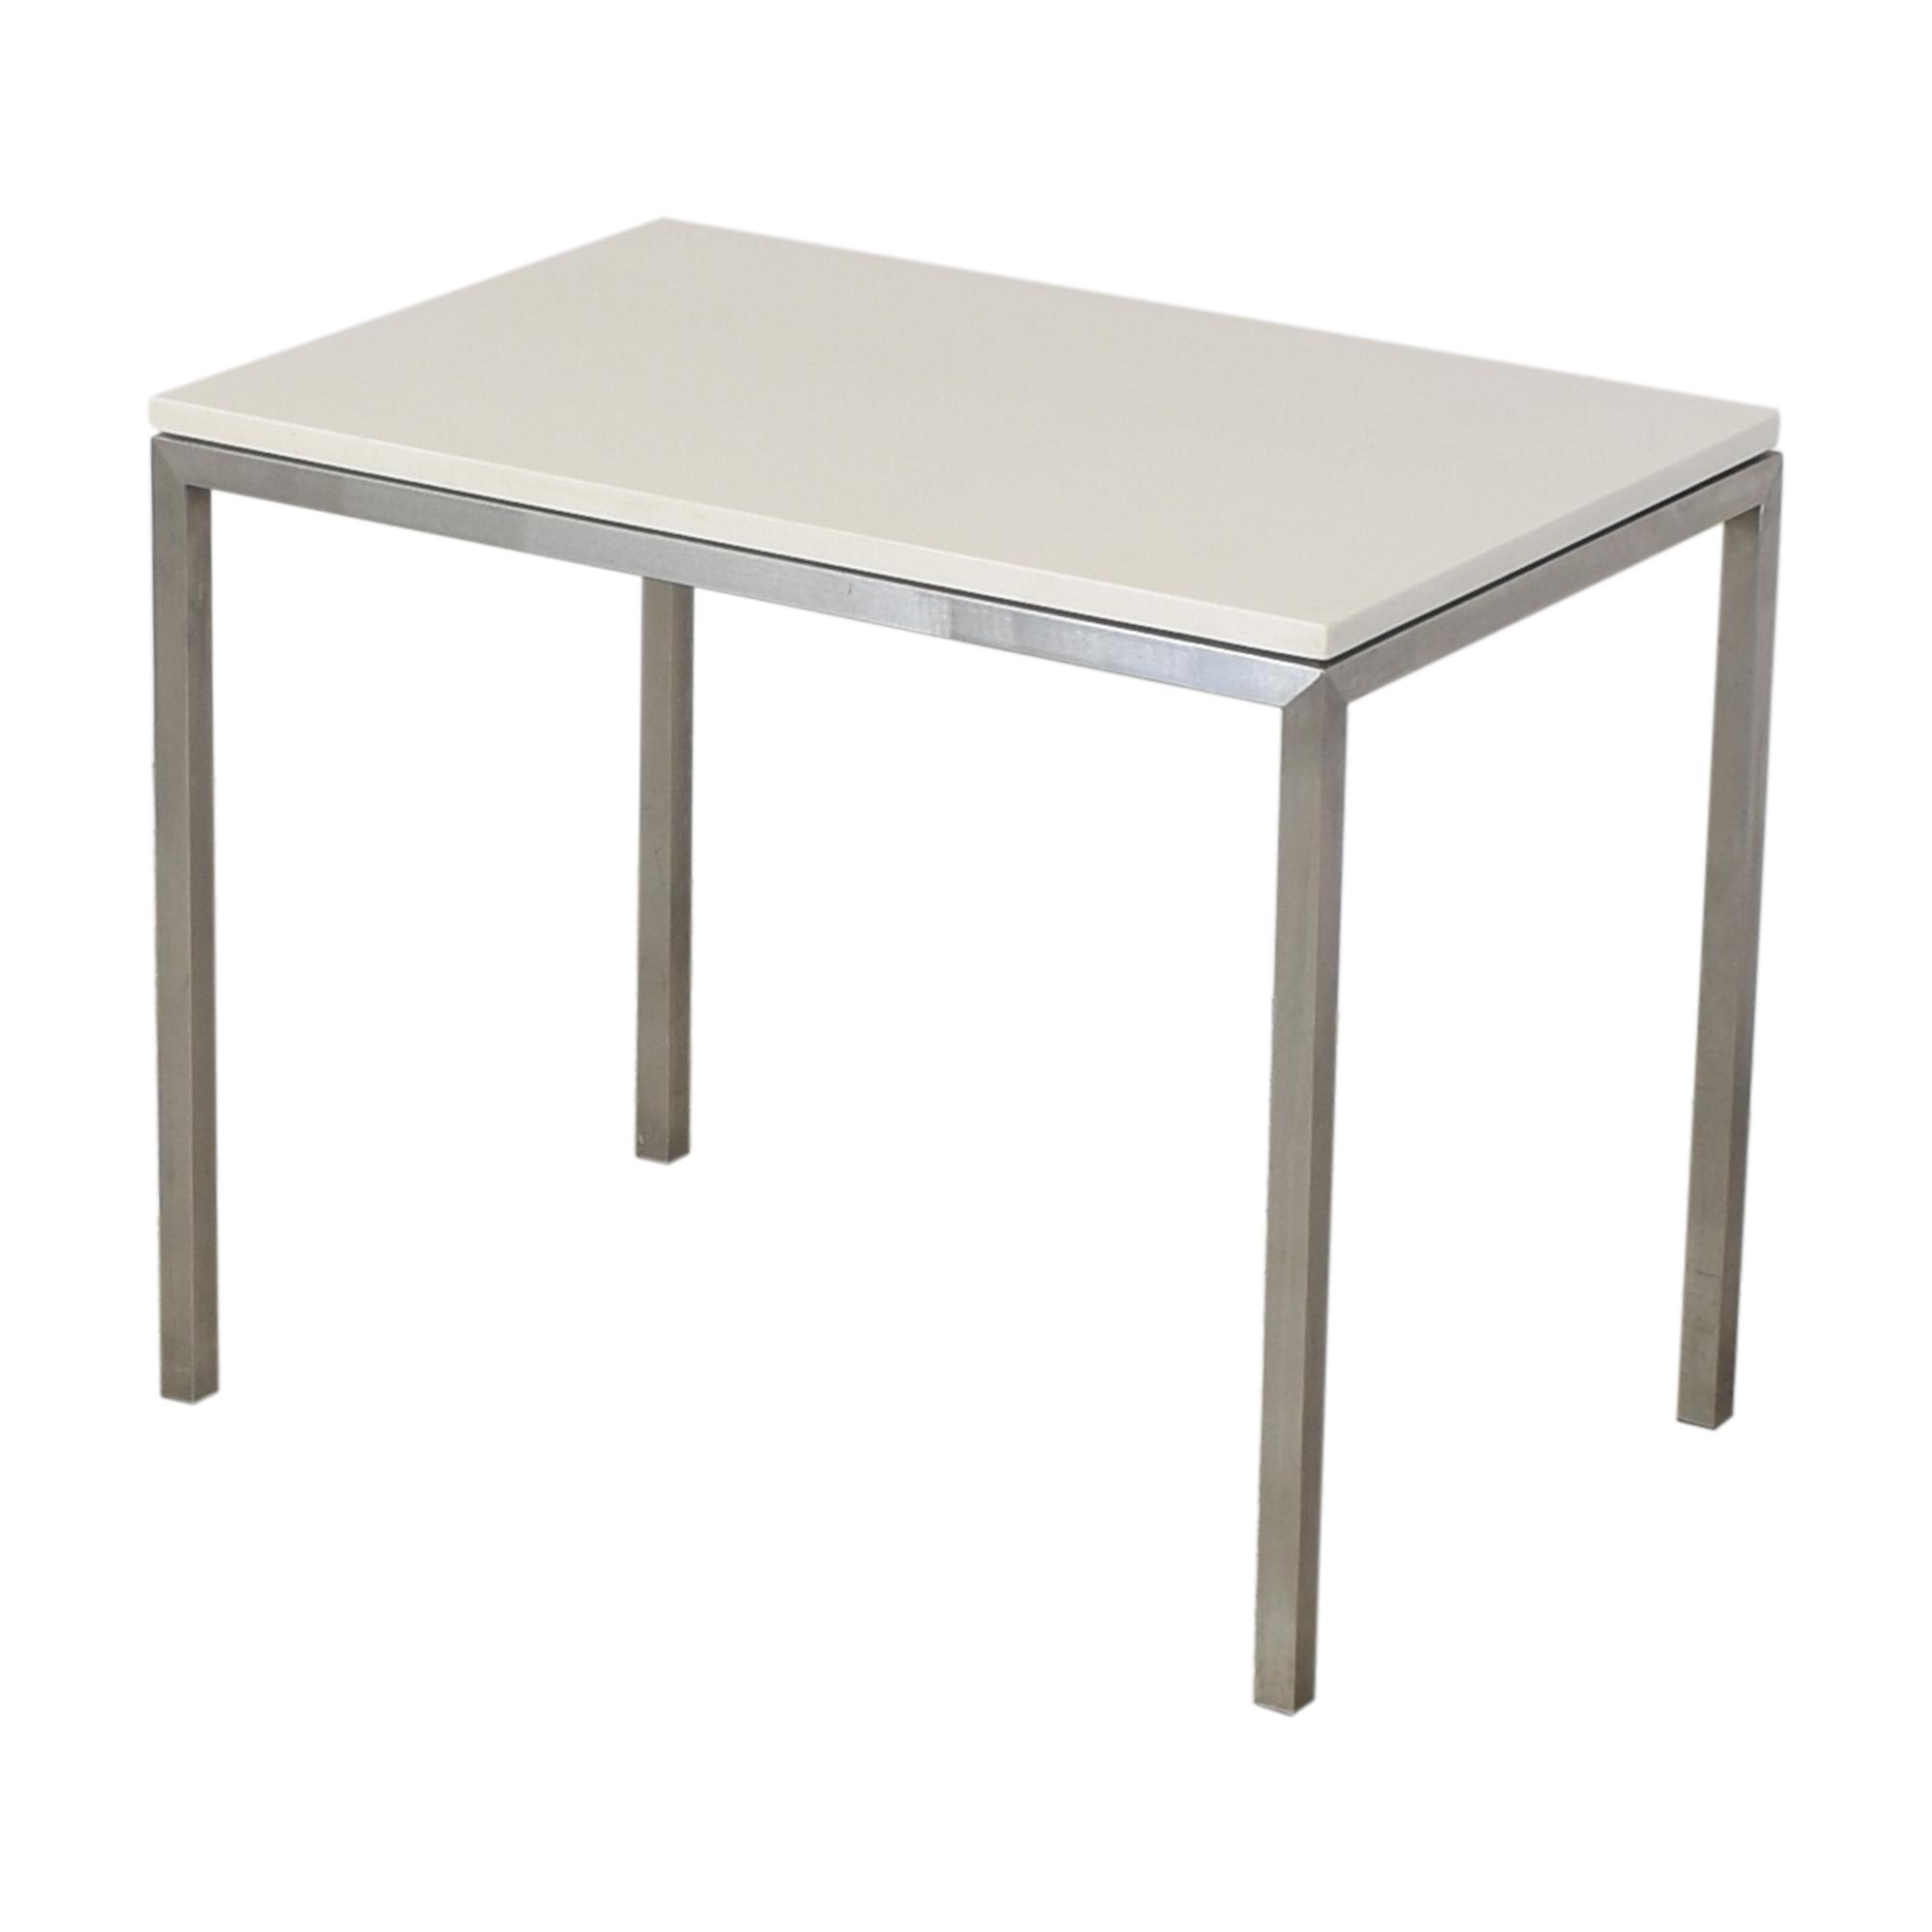 Room & Board Portica Table Room & Board